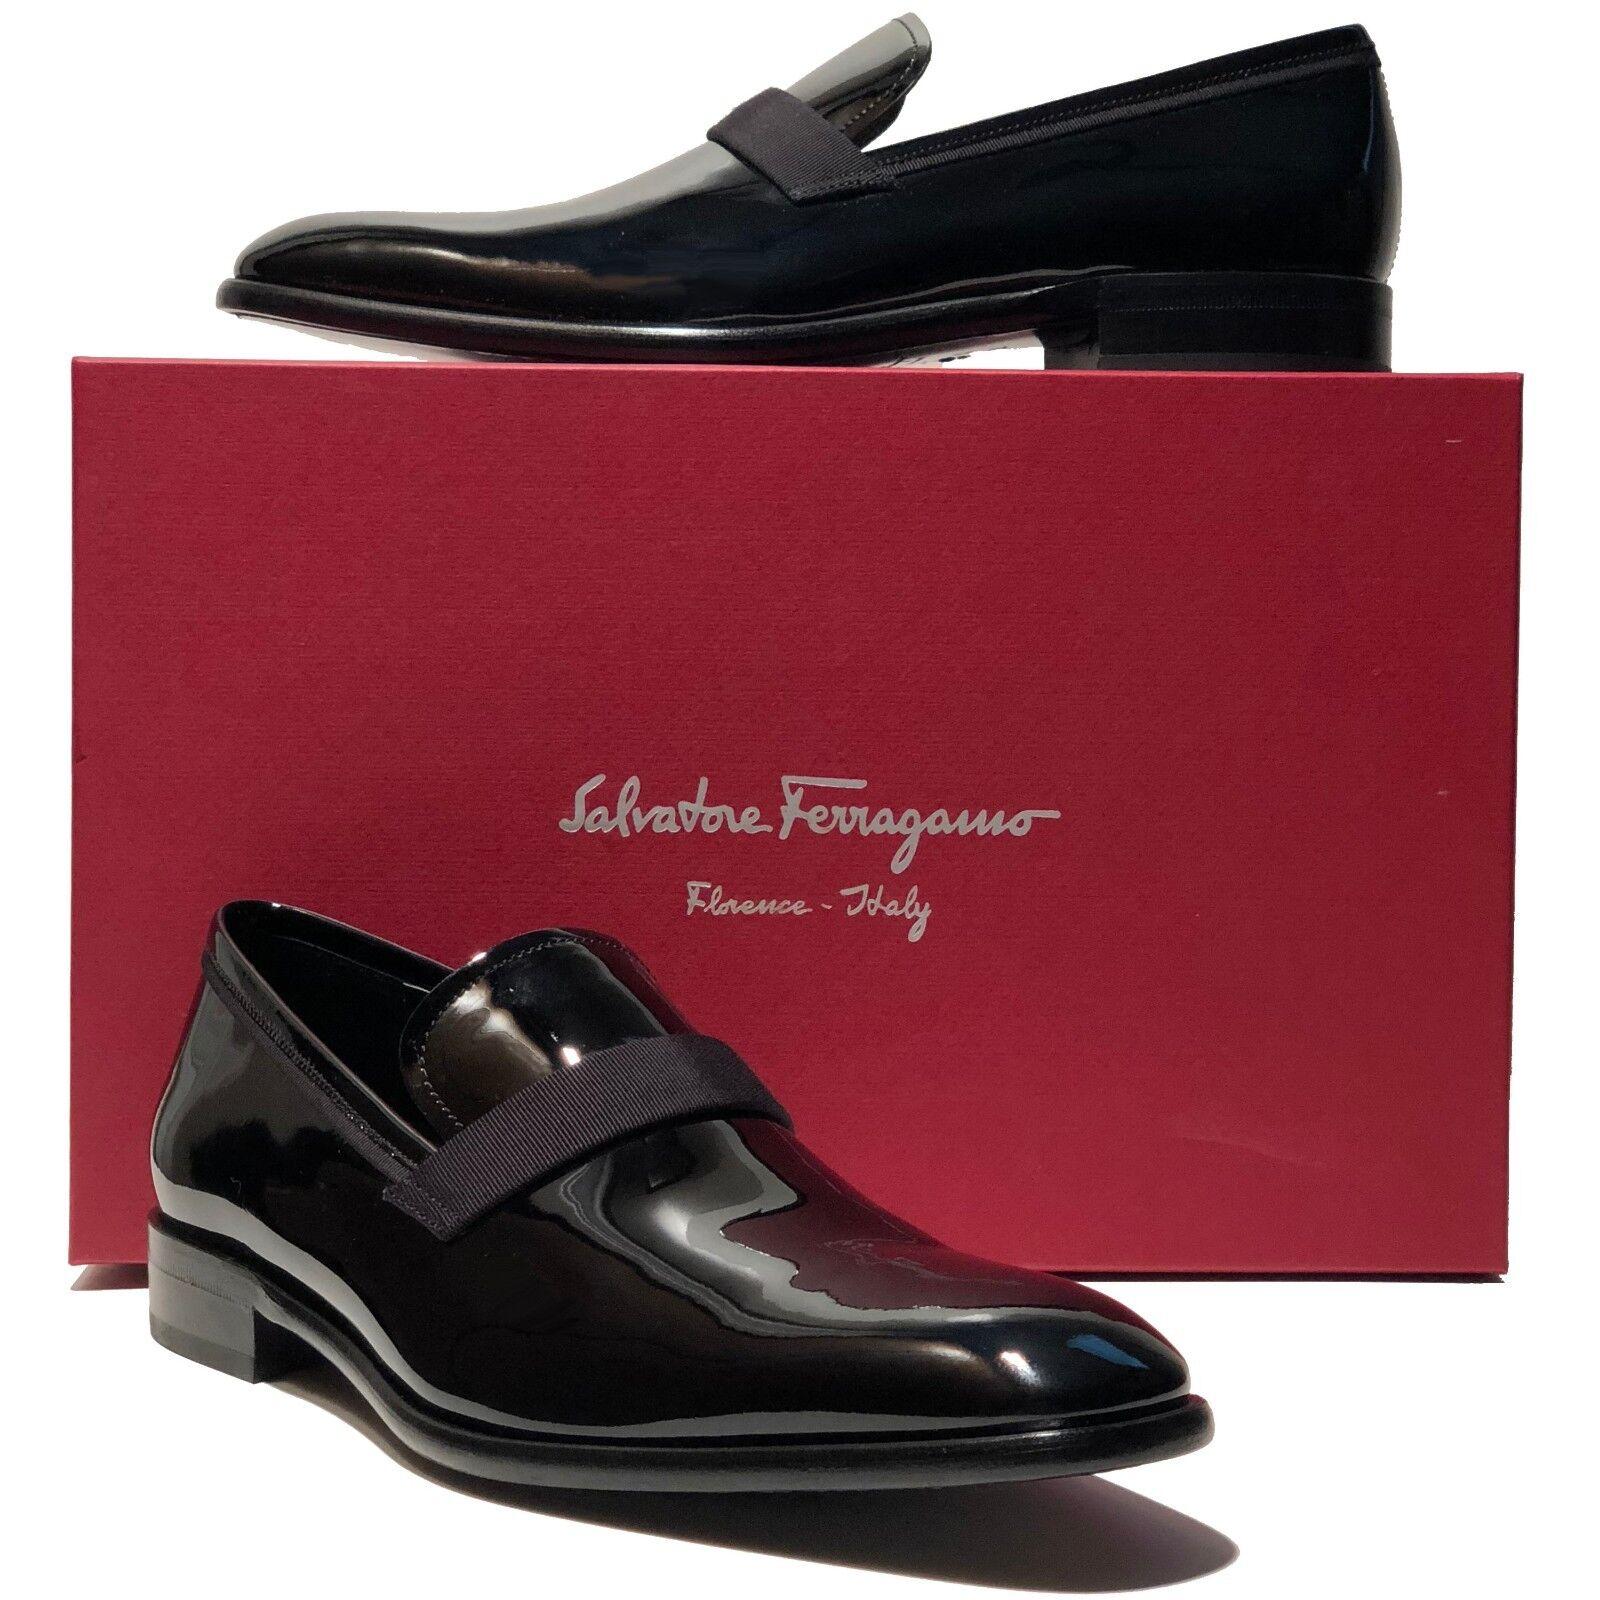 Ferragamo ANTOANE Patent Leather Formal Men's Dress Loafers Tuxedo Wedding scarpe